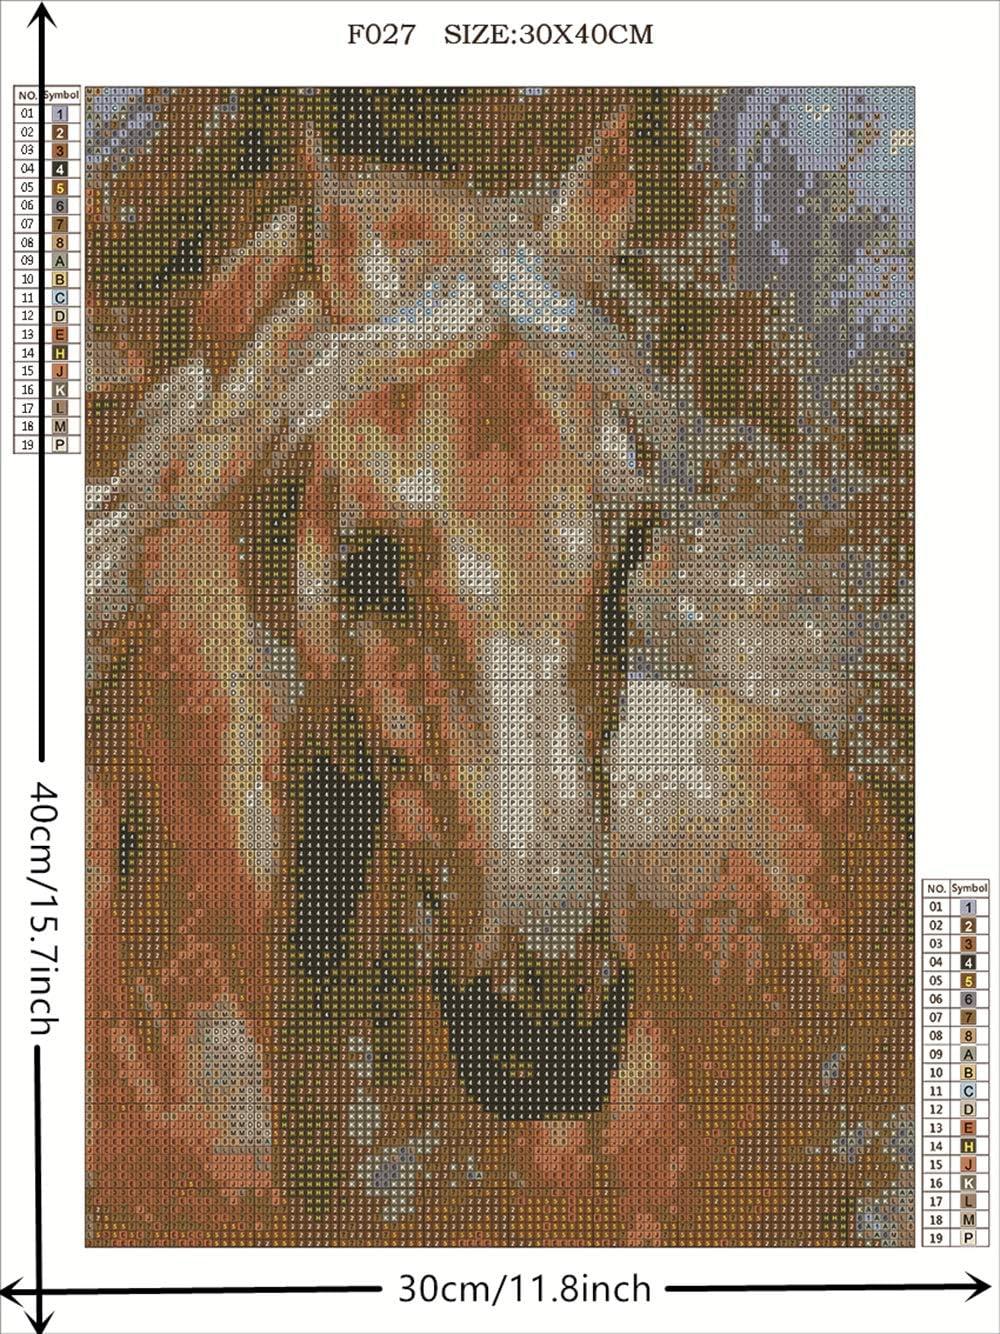 Lxmsja DIY 5D Diamond Painting Square Full Drill Diamond Art Kits Rhinestone Embroidery for Wall Decor 11.8X15.7inch Horse